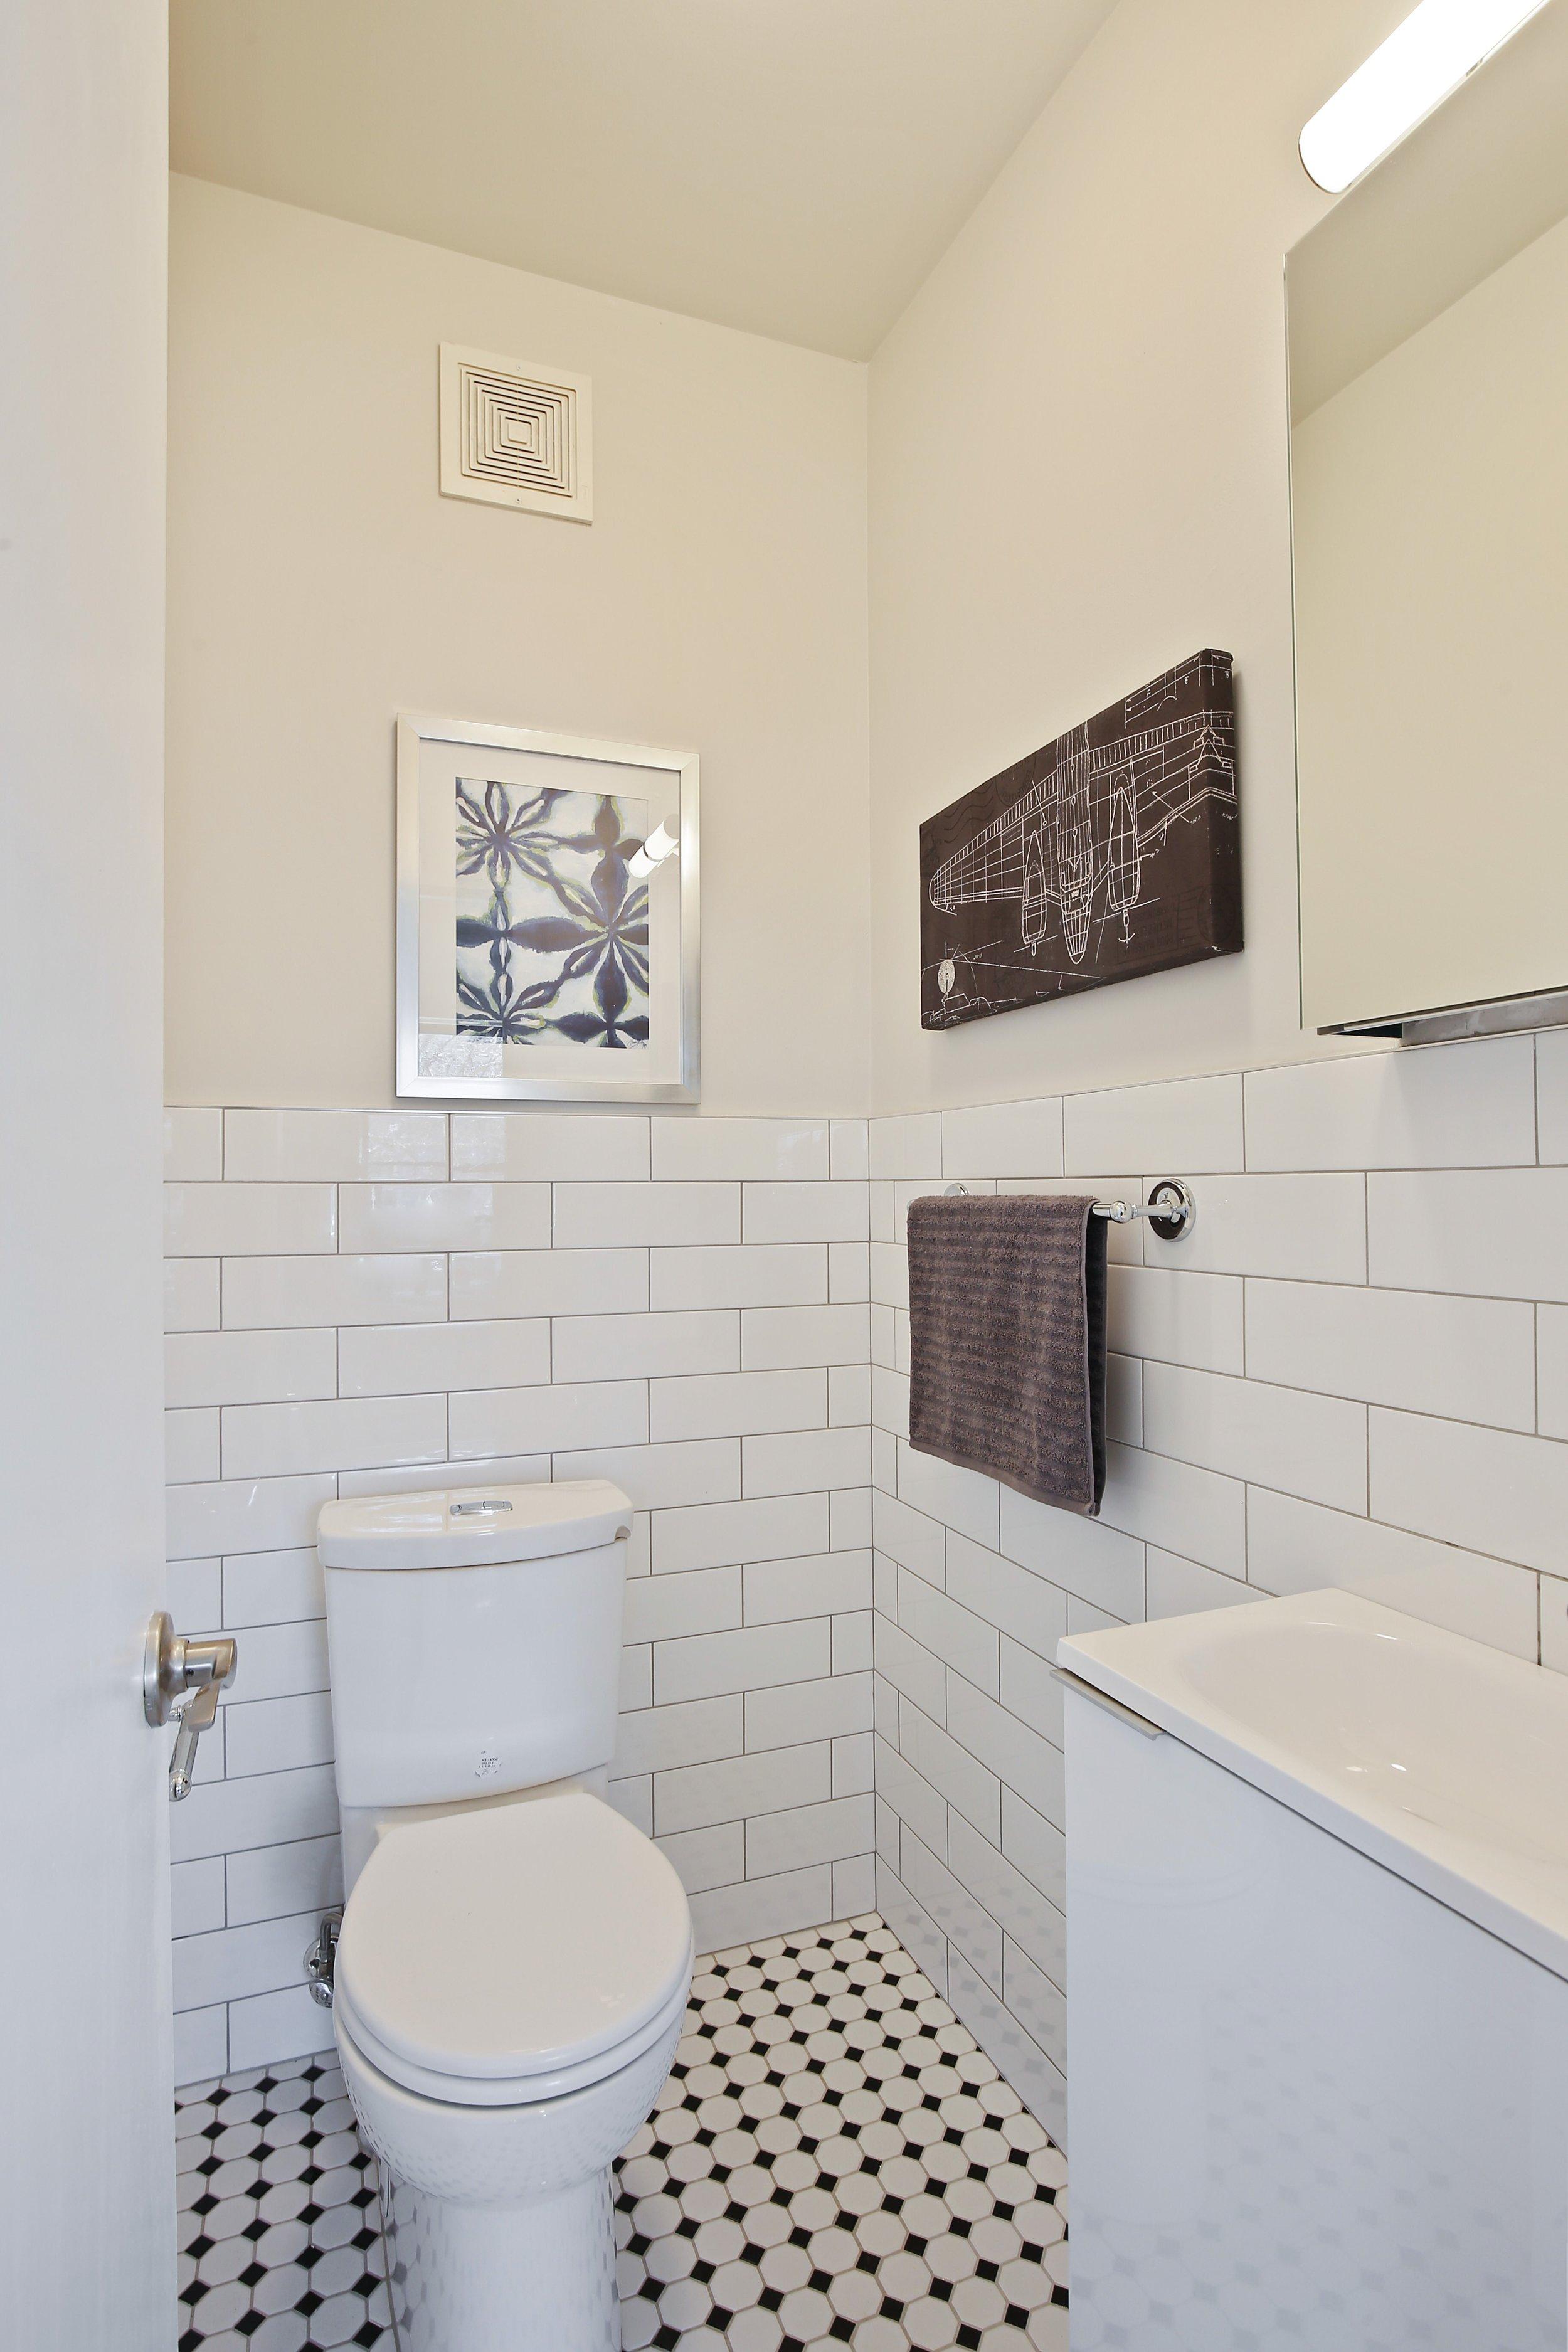 09_289HicksStreet_4_8_Bathroom_HiRes.jpg